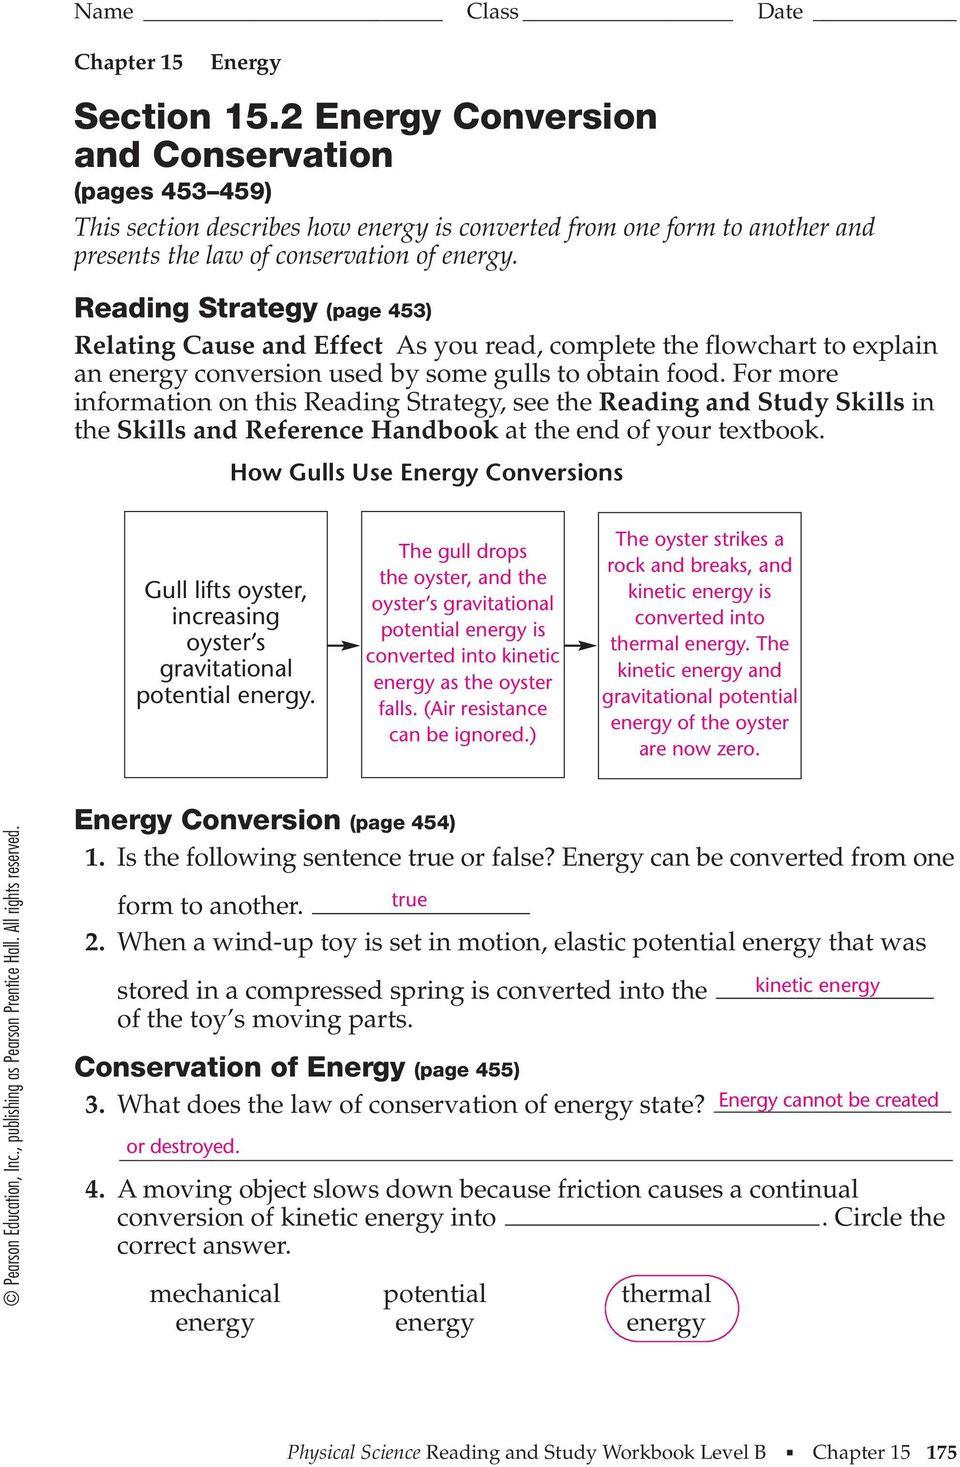 Energy Transformation Worksheet Answer Key Energy Transformation and Conservation Worksheet Energy Etfs